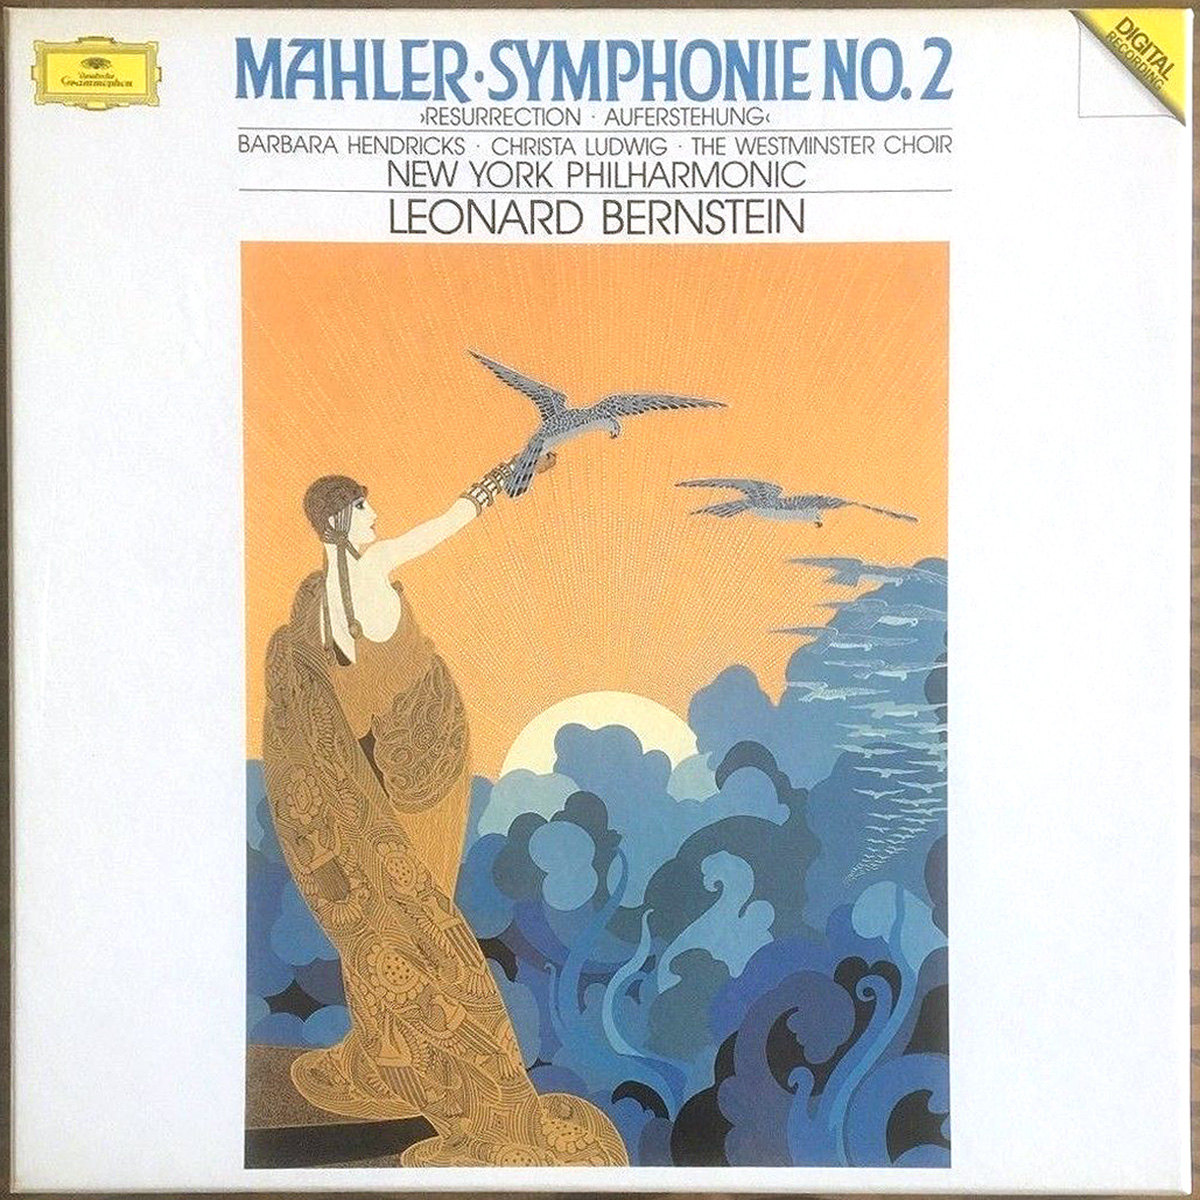 DGG 423 395 Mahler Symphonie 2 Bernstein DGG Digital Aufnahme